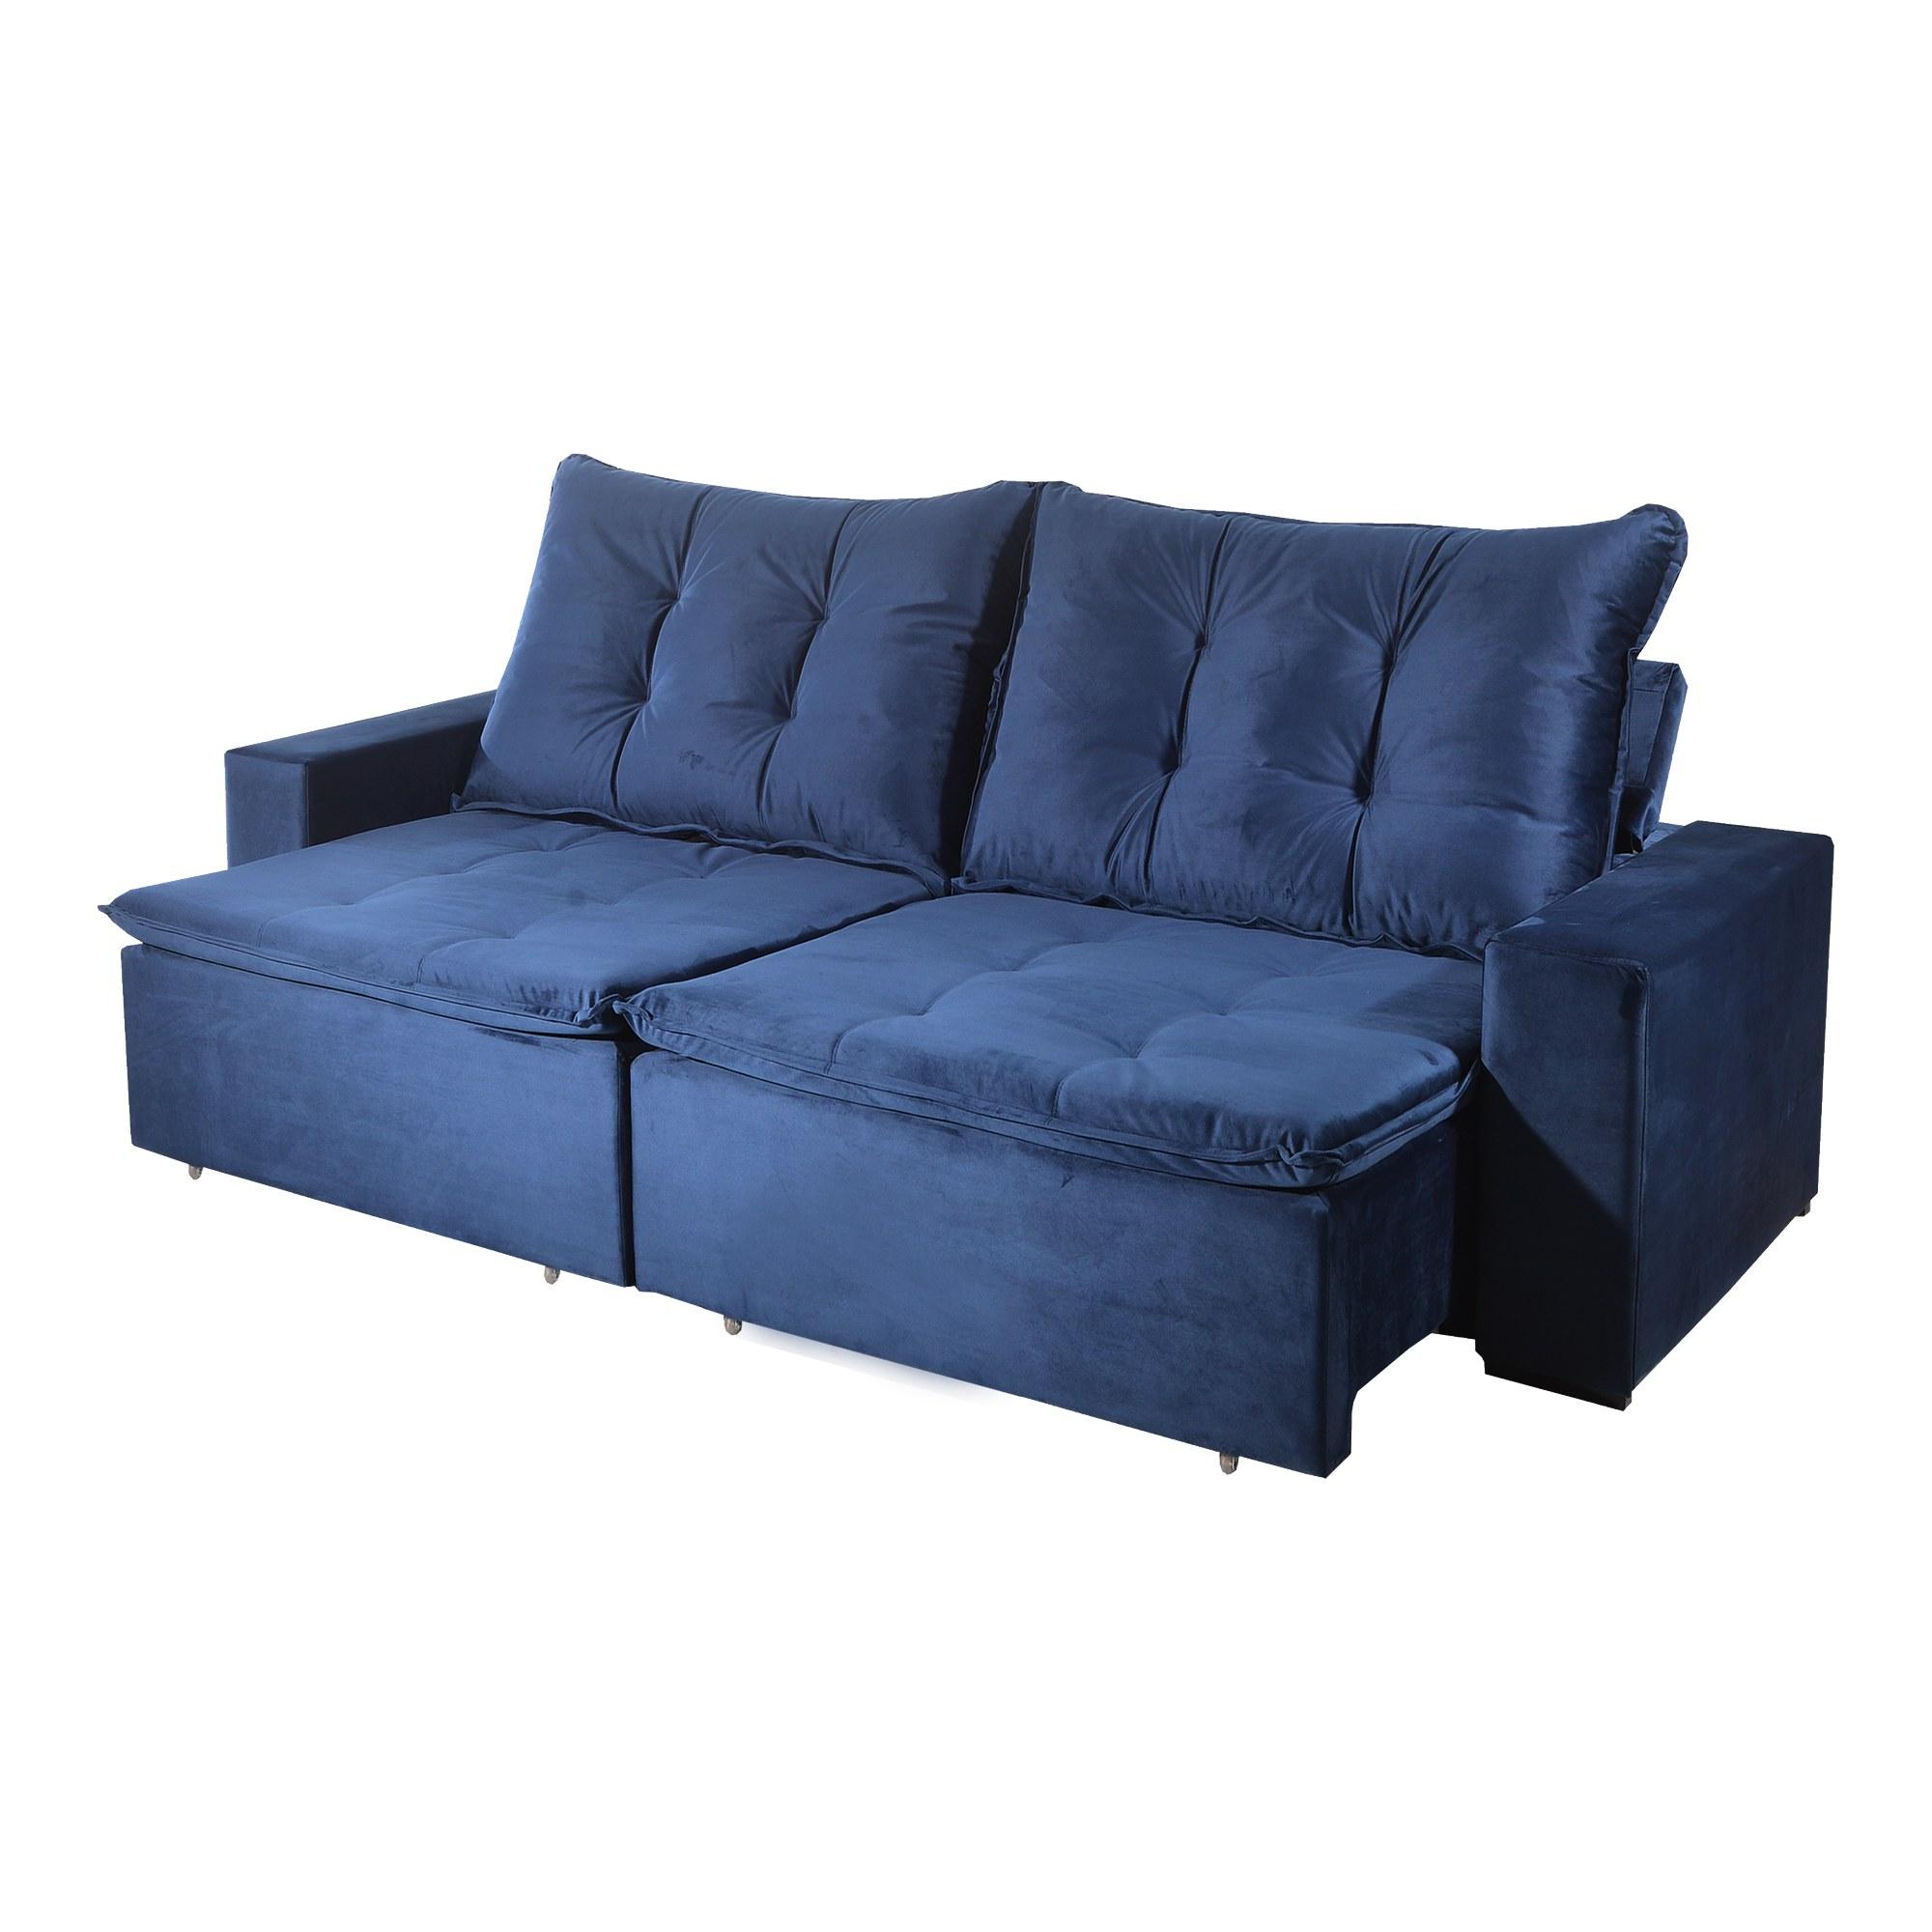 Sofá Retrátil e Reclinável Bom Pastor Stella 4 Lugares 2,50m Veludo Luxo Azul